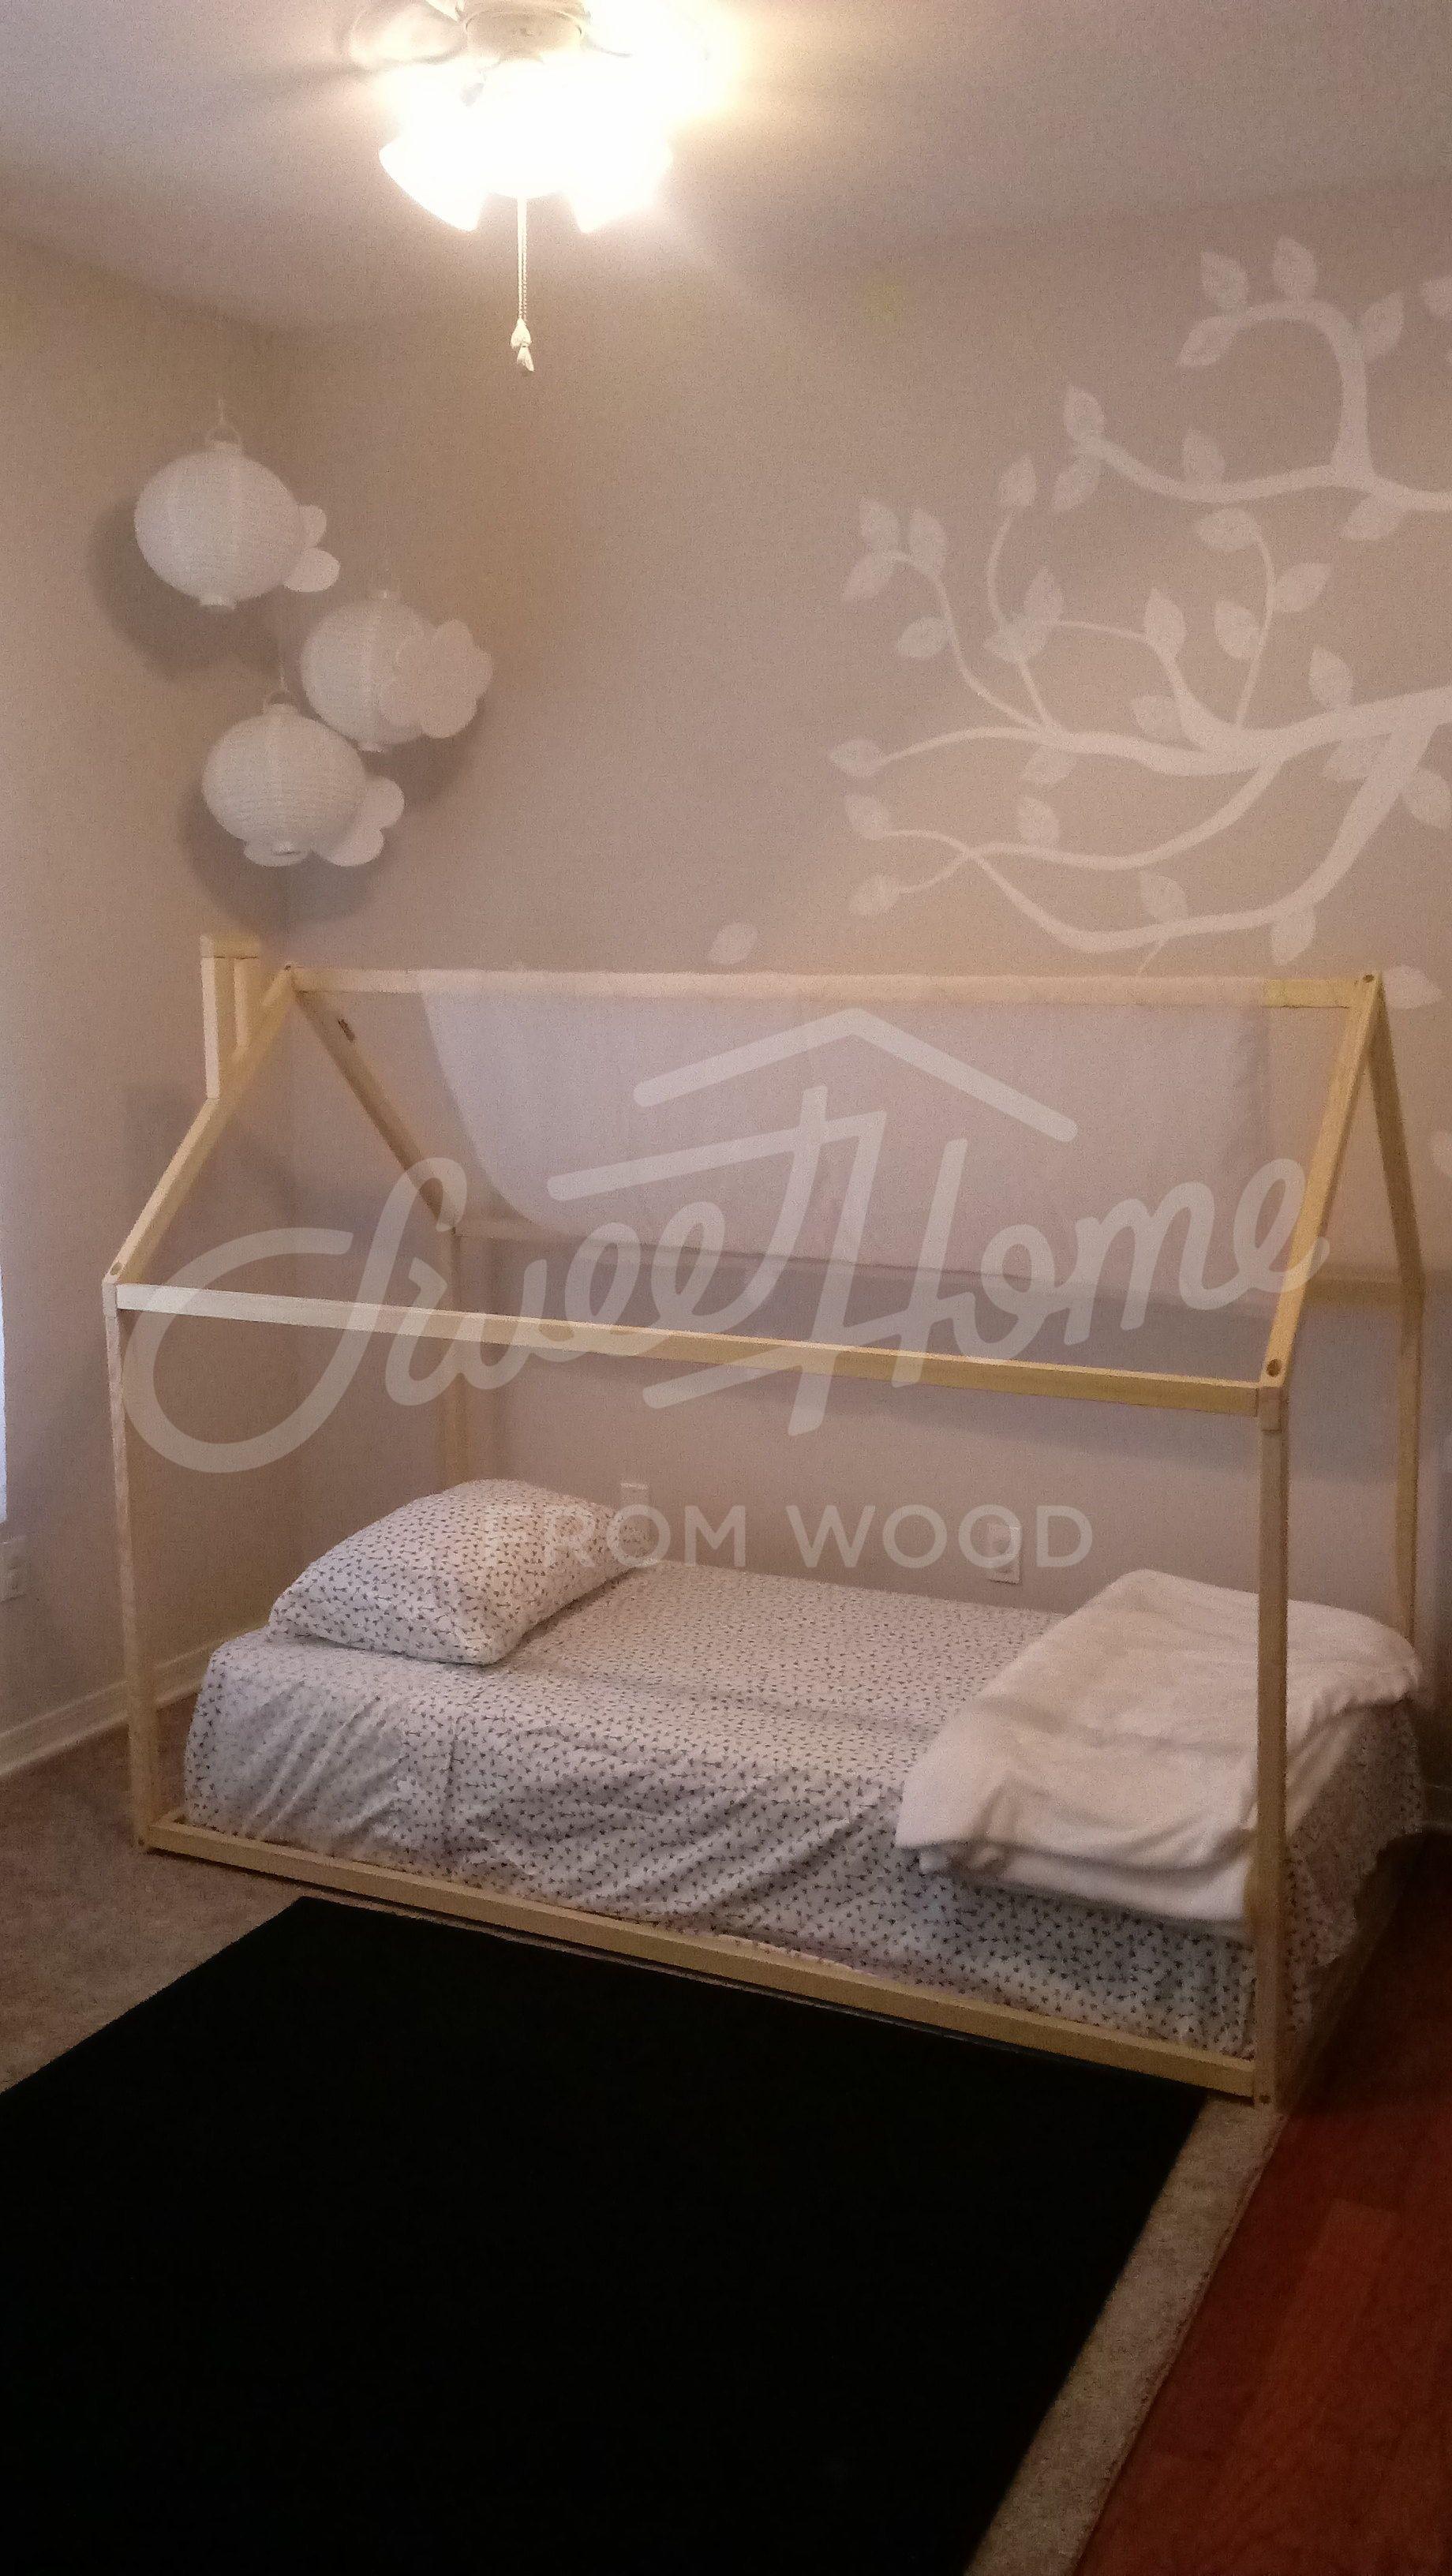 Toddler Bed House Shaped Bed Loft Bed Nursery Wood House Bed Etsy Bed Tent Kids Room Murals Kids Bed Frames